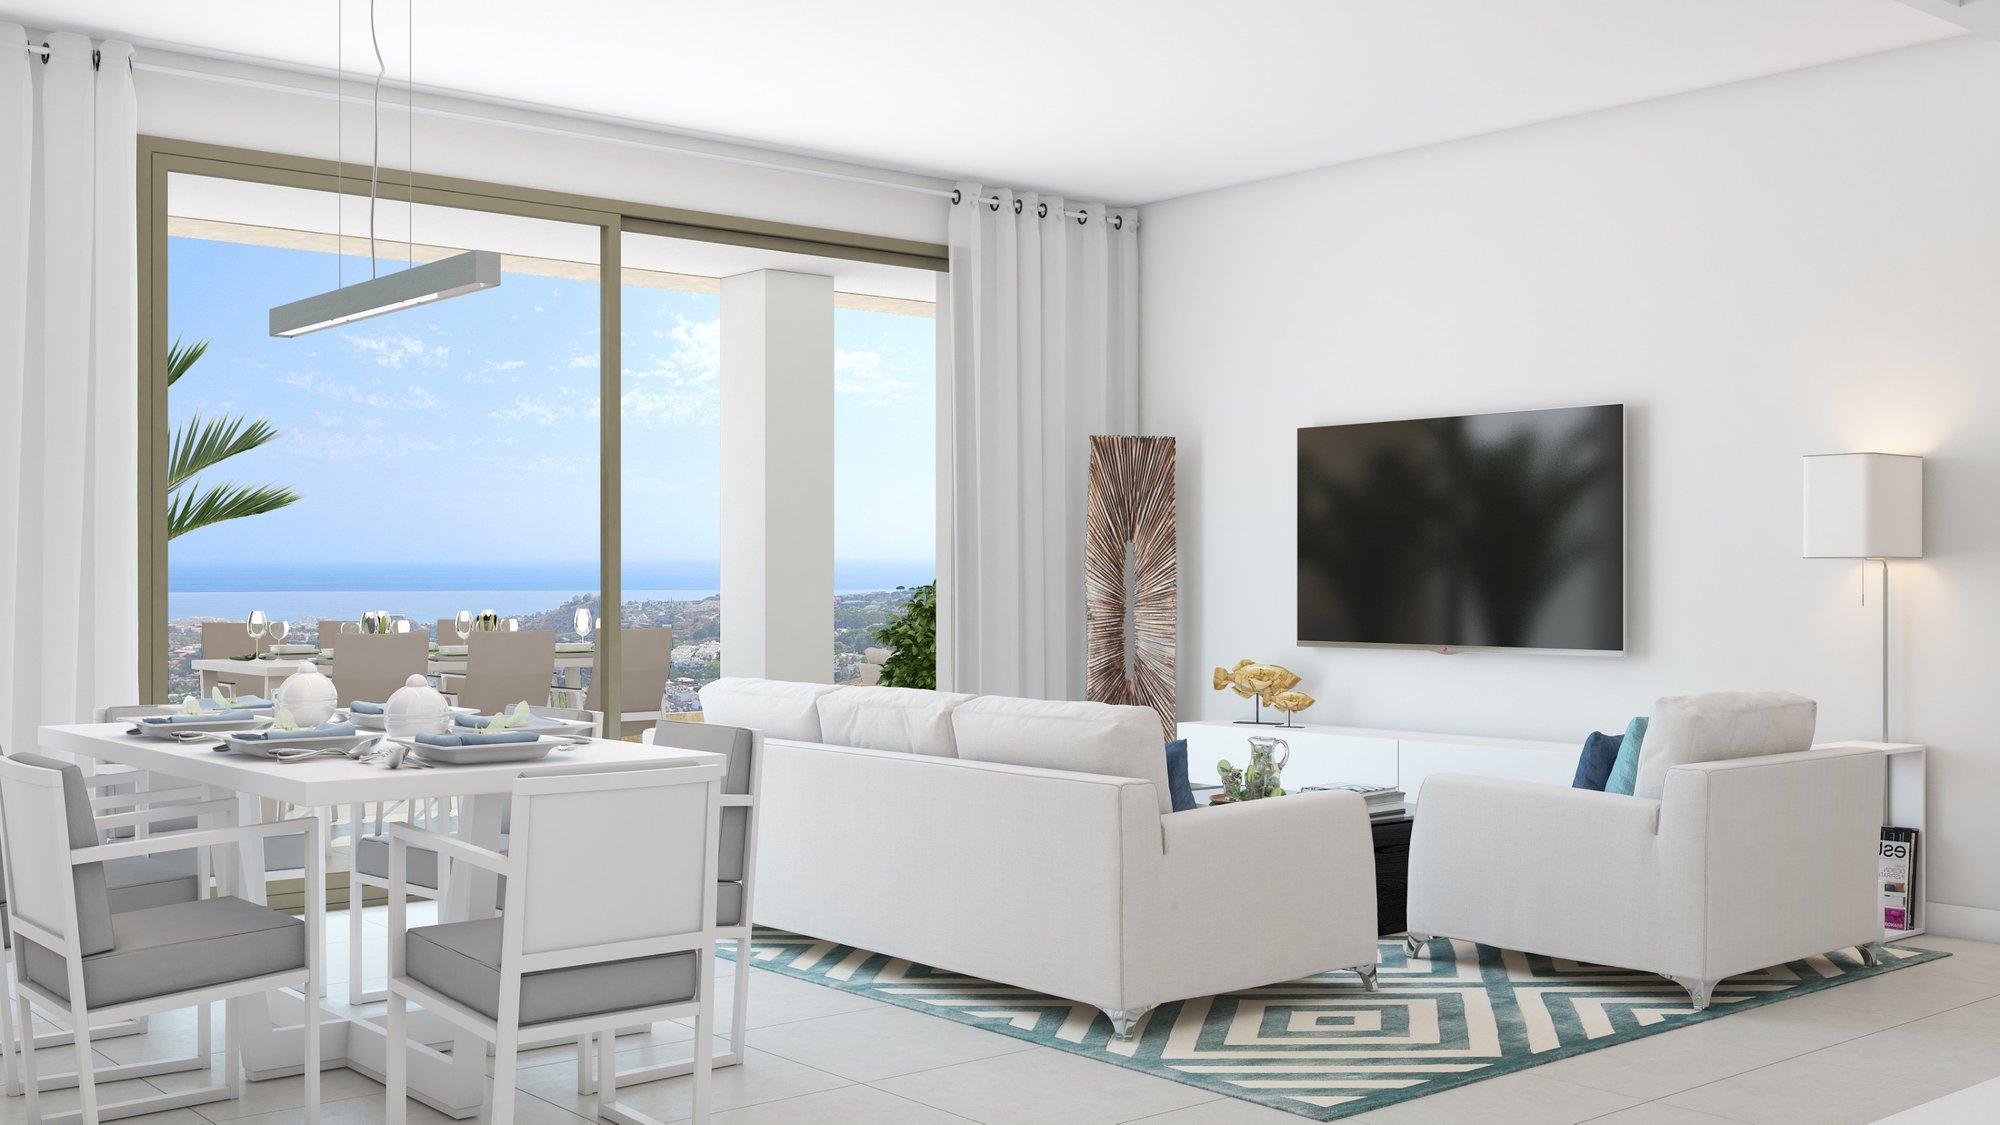 Apartment for sale in Benalmadena